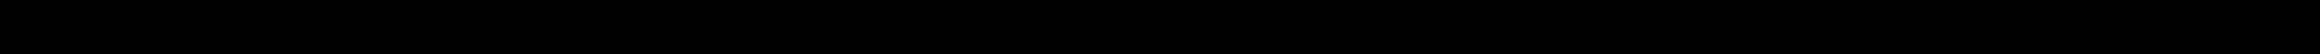 MANN-FILTER 11 42 1 744 001, 11 42 7 549 573 Φλάντζα, φίλτρο λαδιού